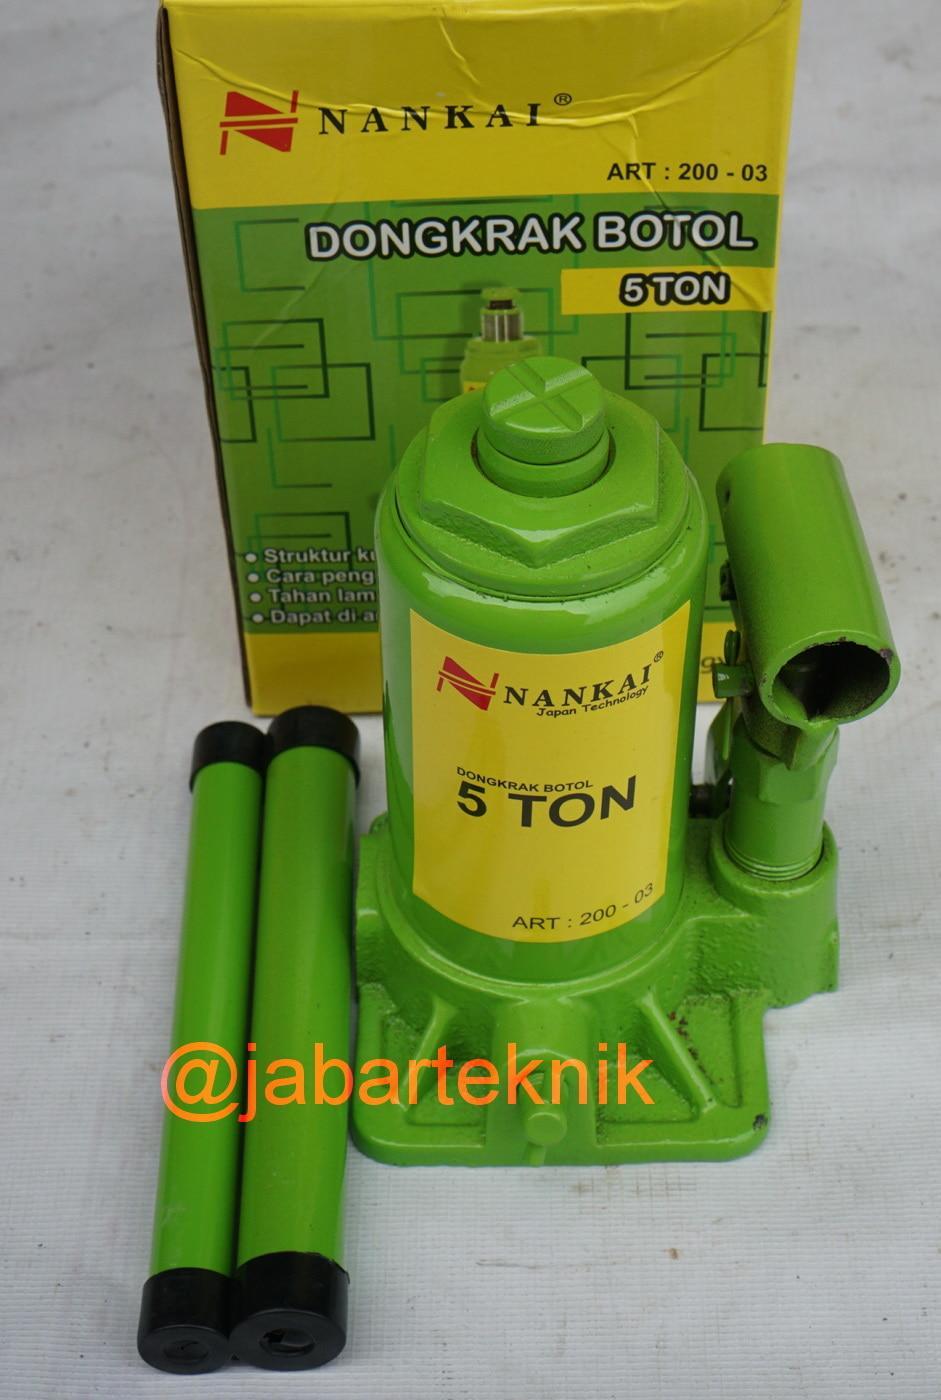 Fitur Dongkrak Mobil Emergency 3 Ton Model Botol Dan Harga Terkini Tekiro 20 5 Termurah Nankai